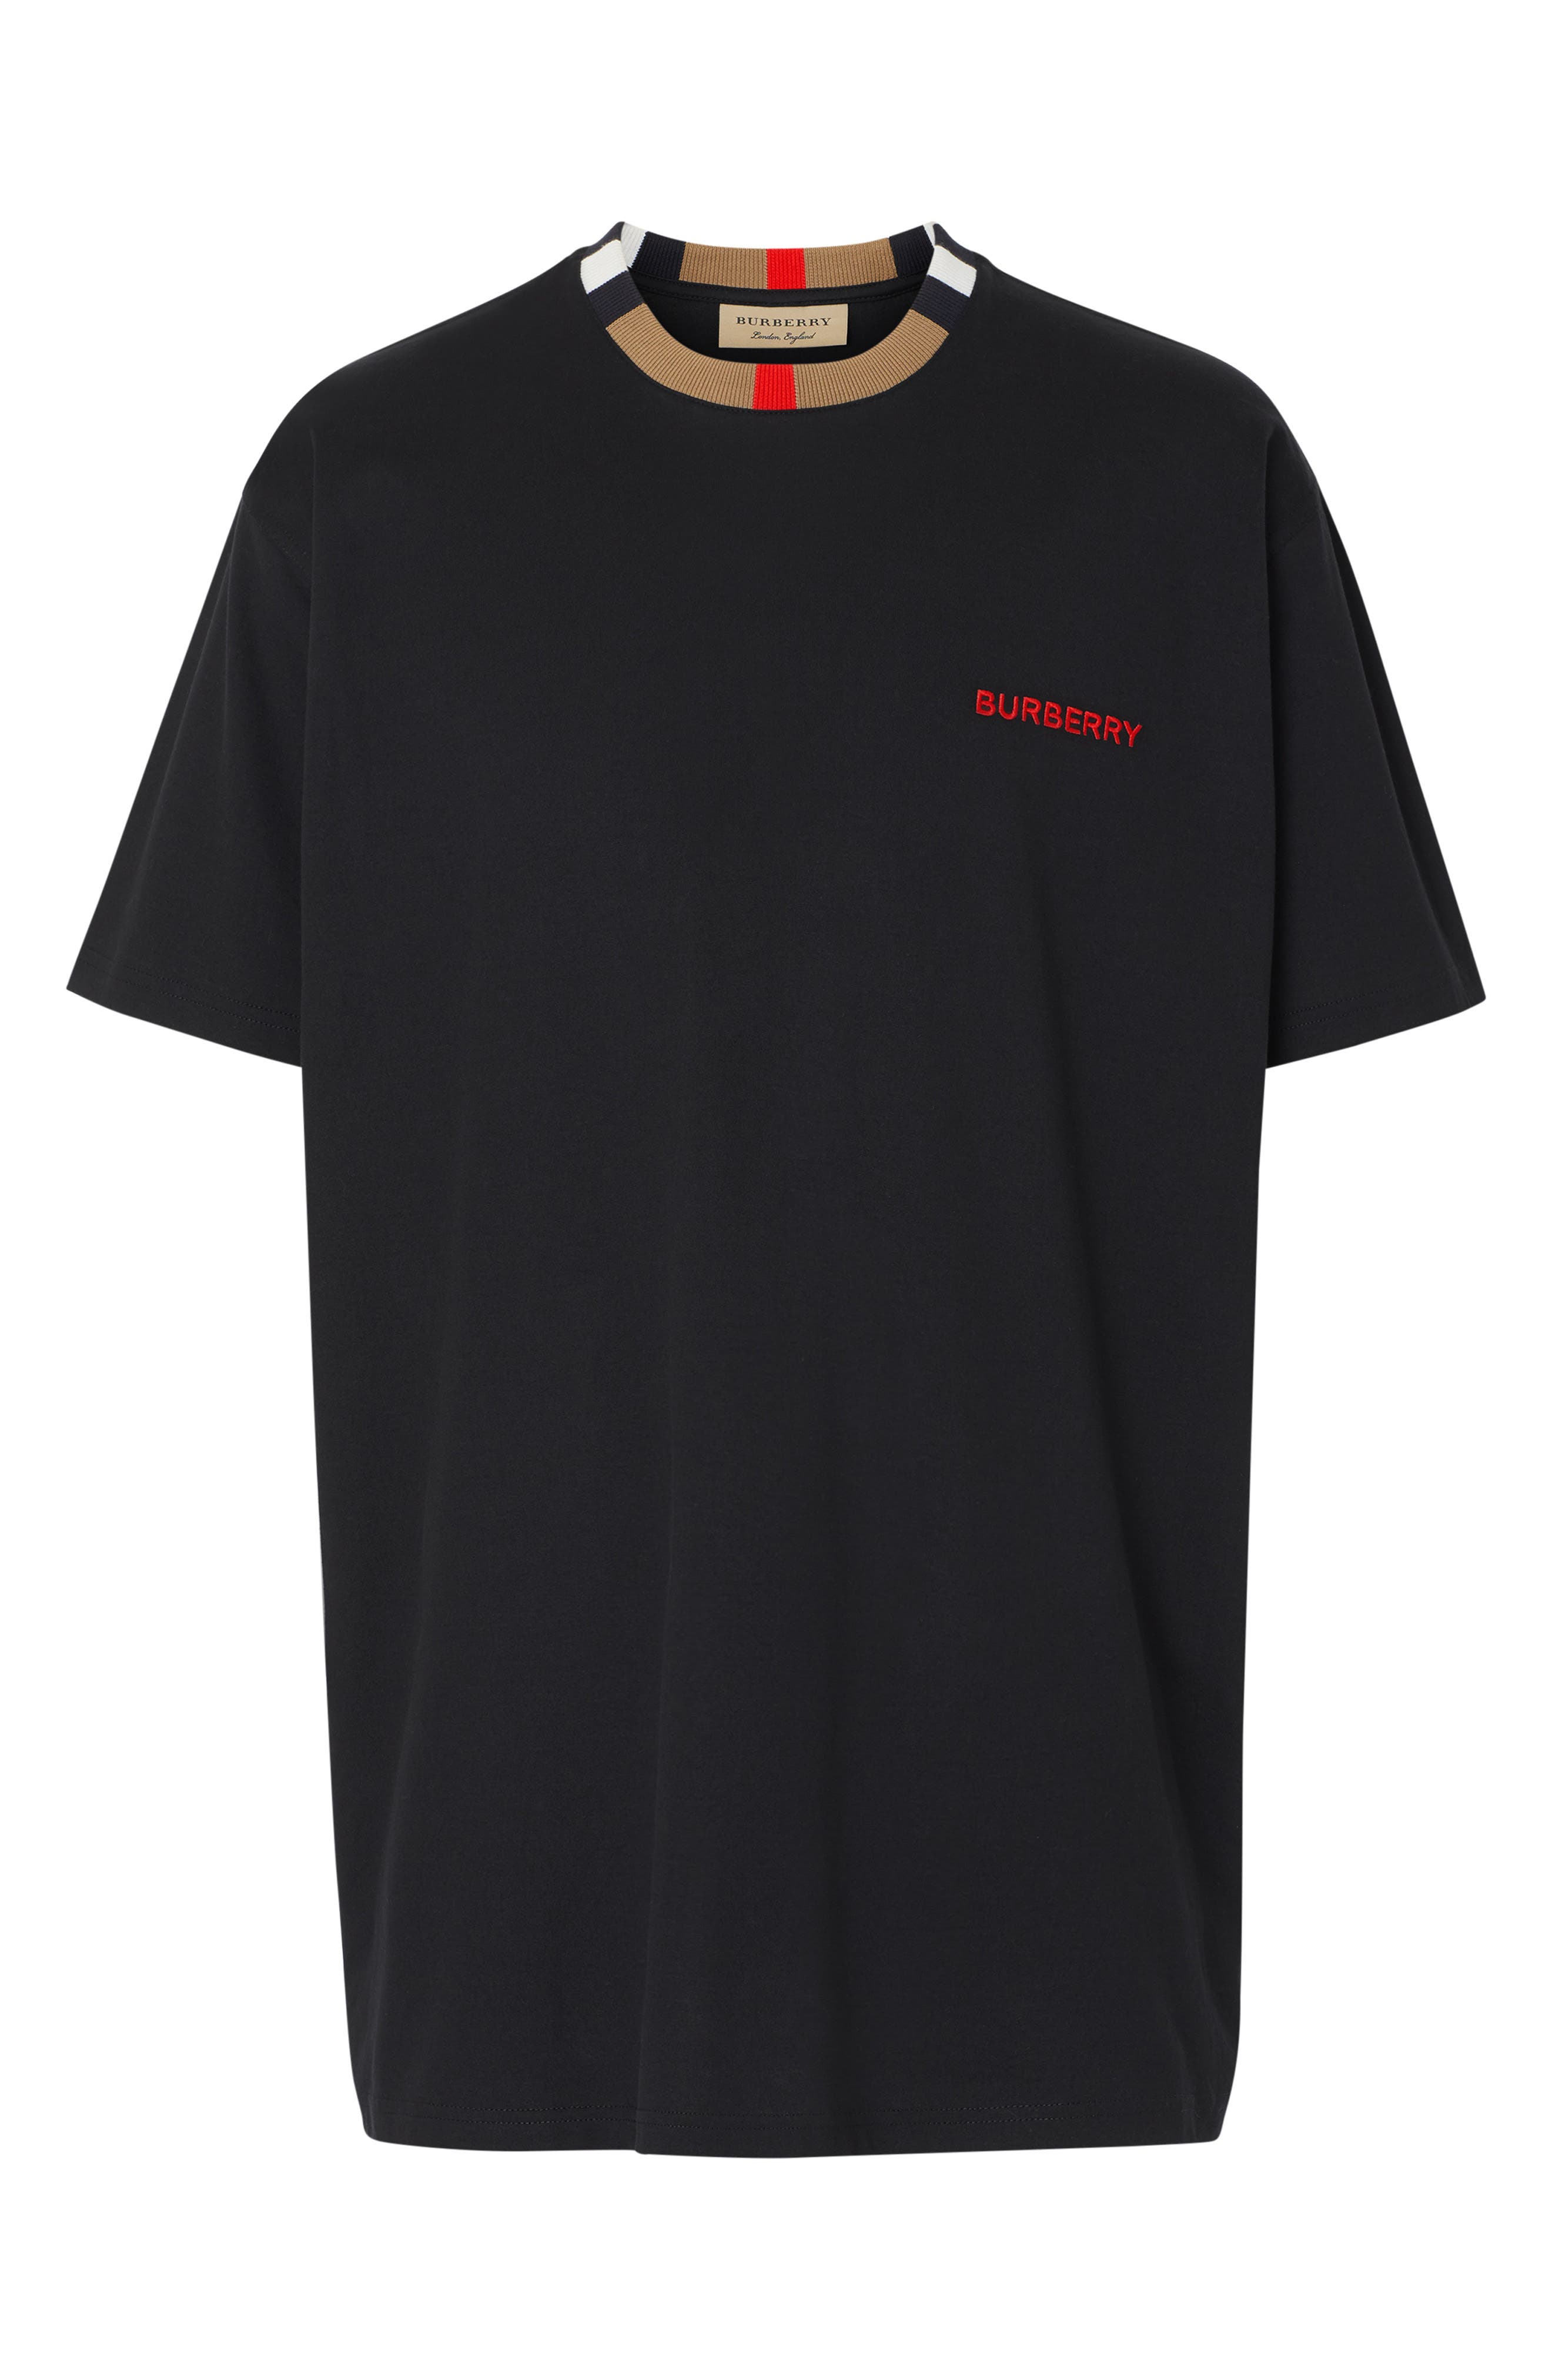 BURBERRY, Jayson Icon Stripe T-Shirt, Alternate thumbnail 5, color, BLACK